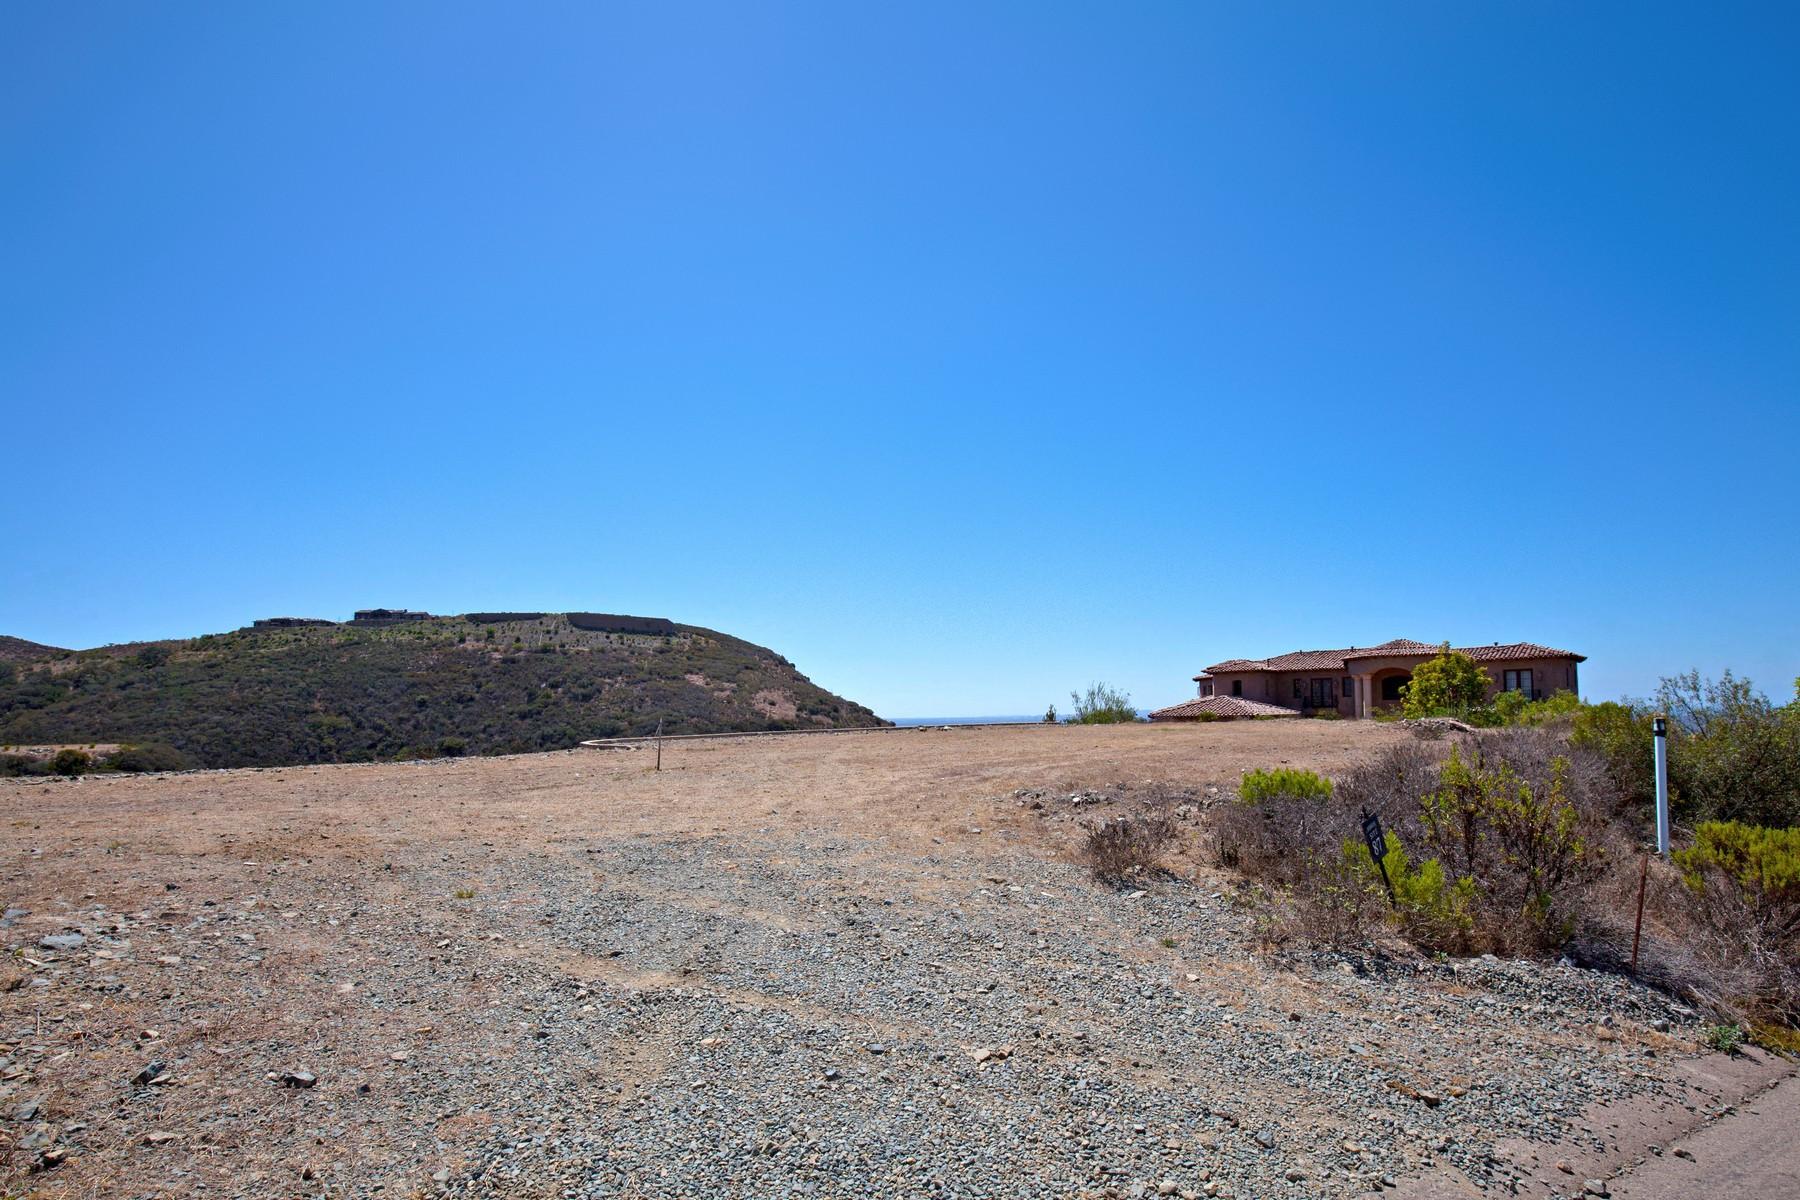 Additional photo for property listing at El Brazo lot 87  Rancho Santa Fe, California 92067 United States